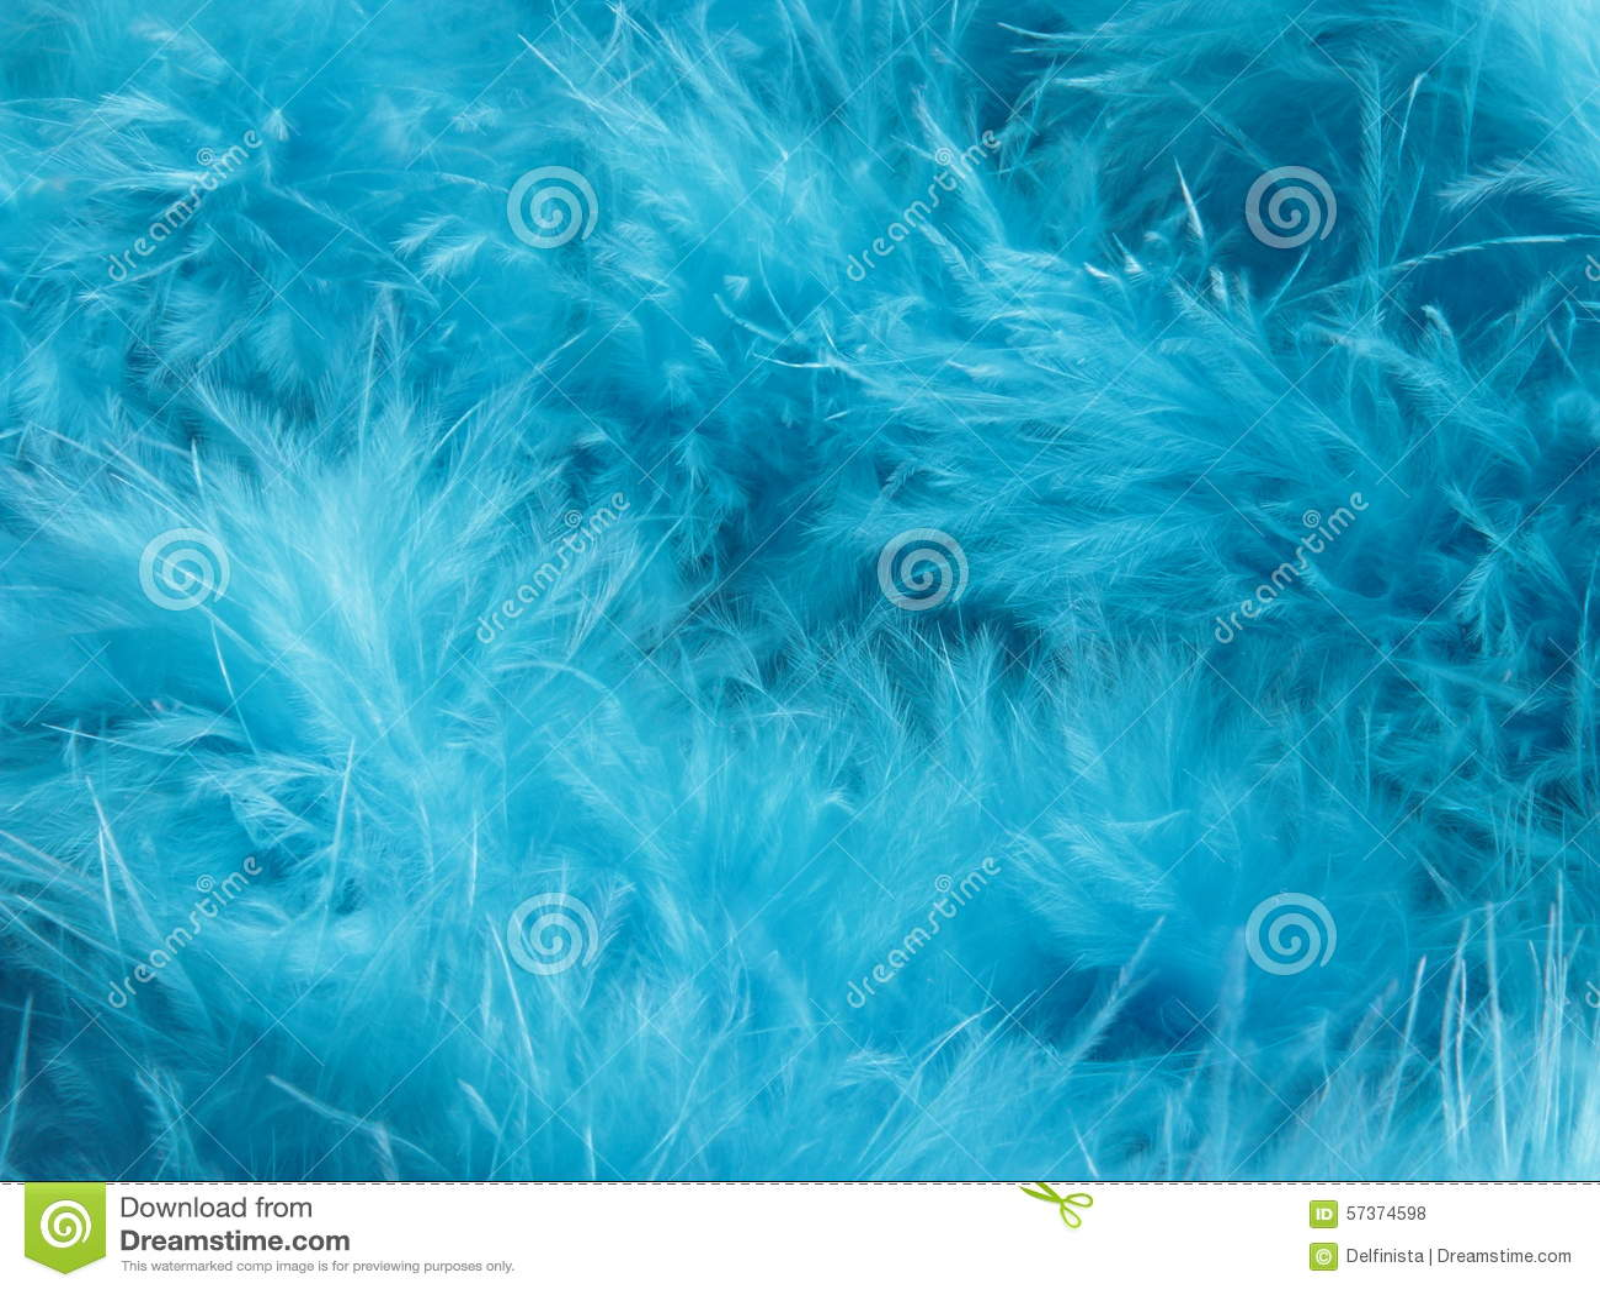 turquoise feathers background